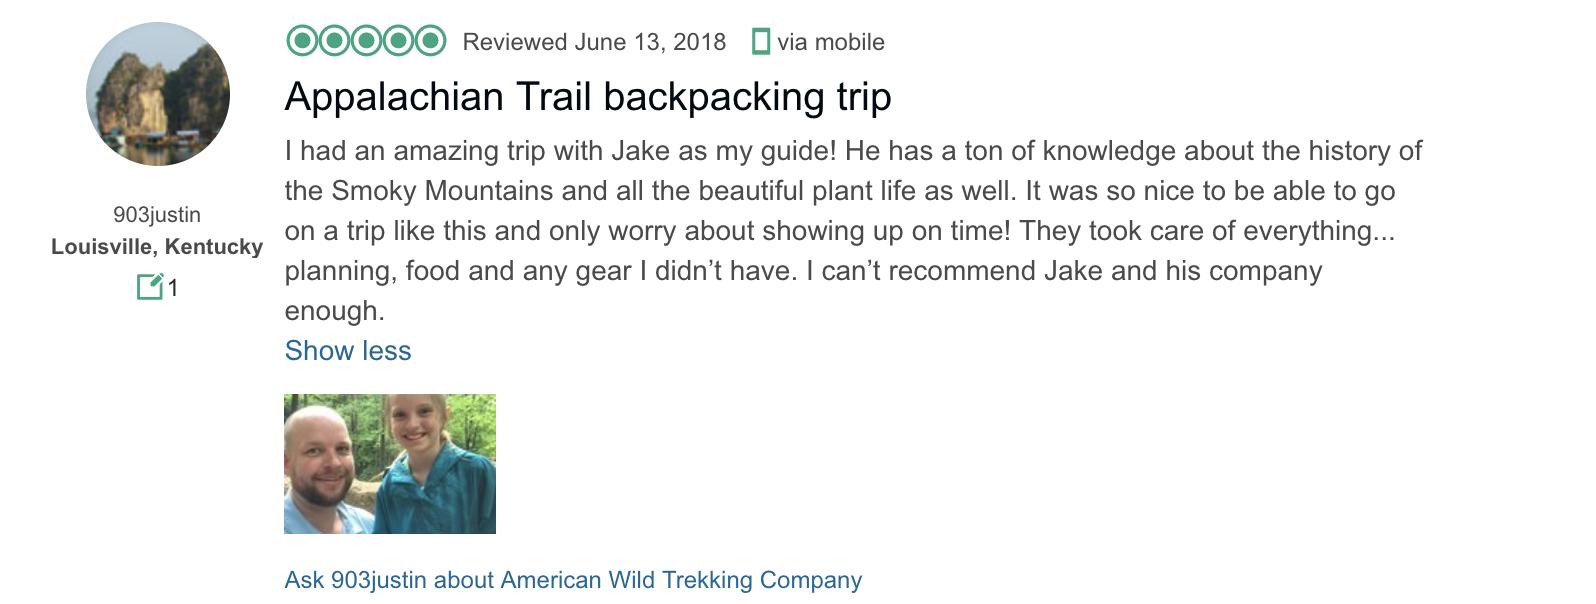 TripAdvisor Review- American Wild Trekking- Appalachian Trail Backpacking Trip